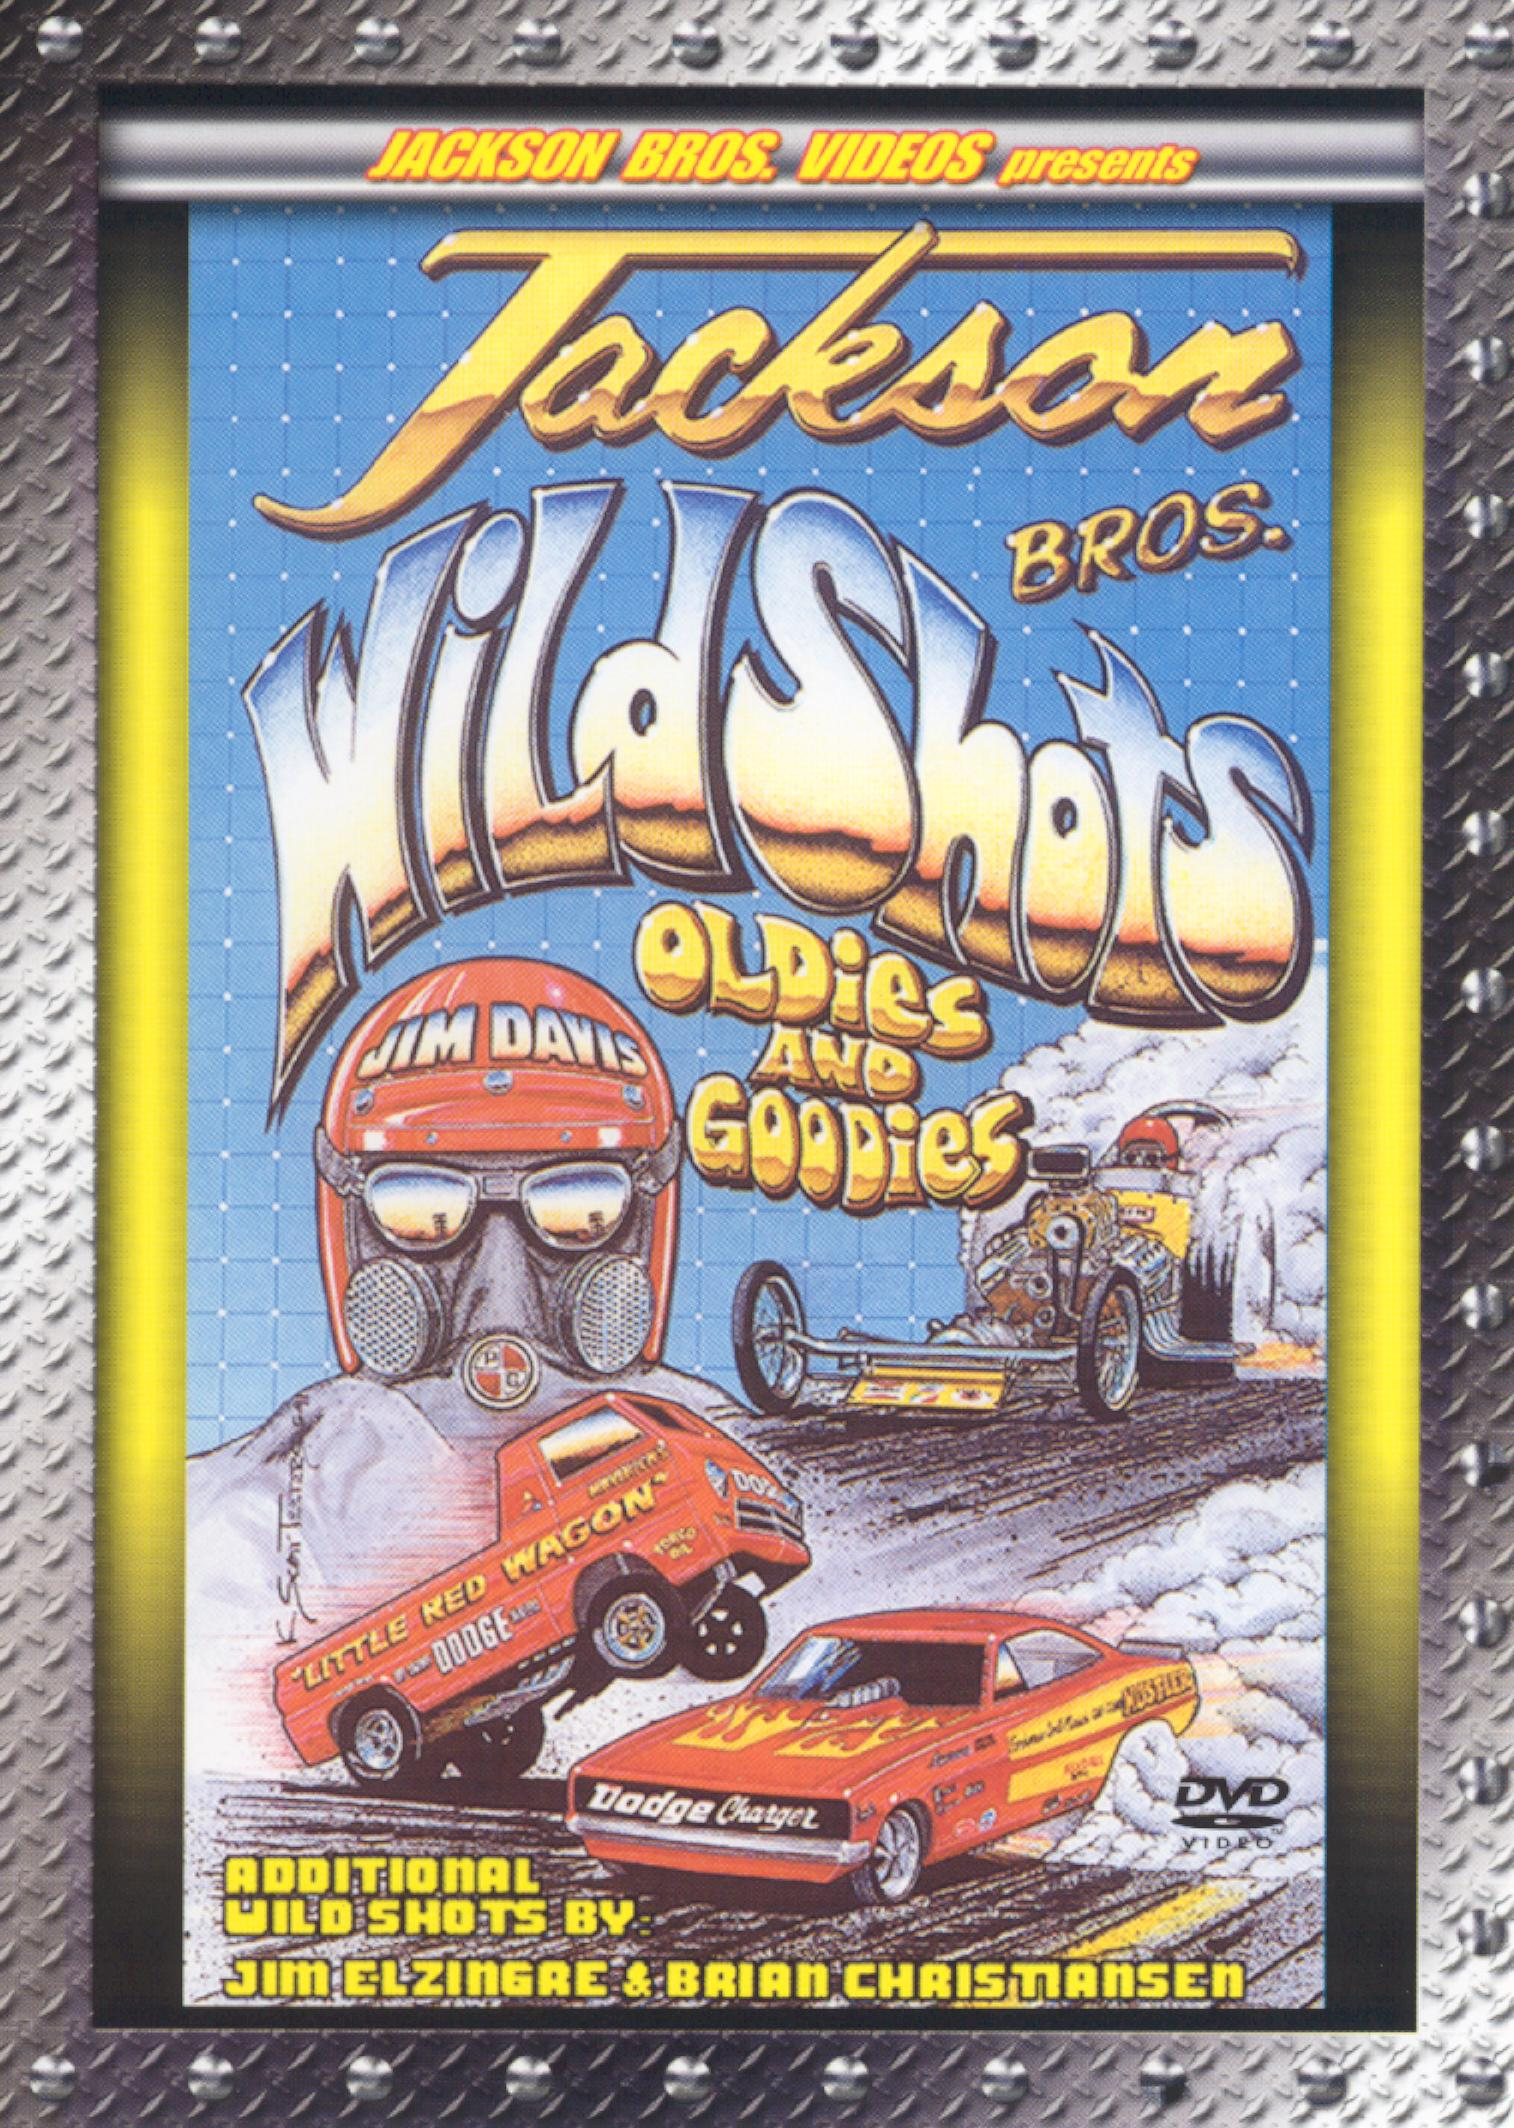 White Knuckle Extreme: Wild Shots - Oldies & Goodies